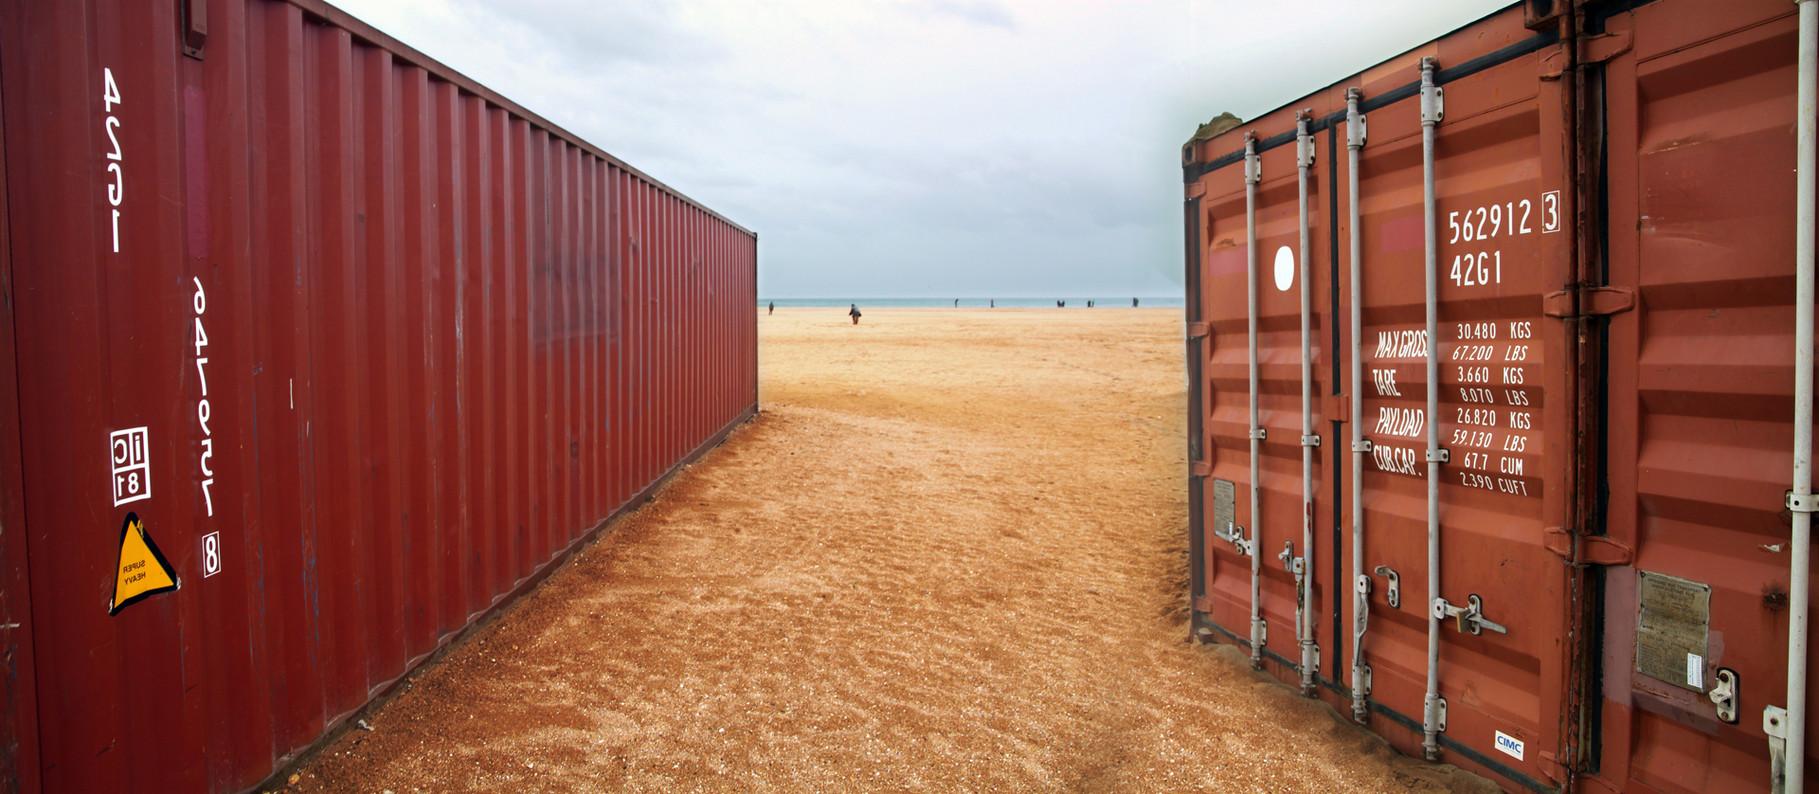 Olivier Gherrak-Les containers